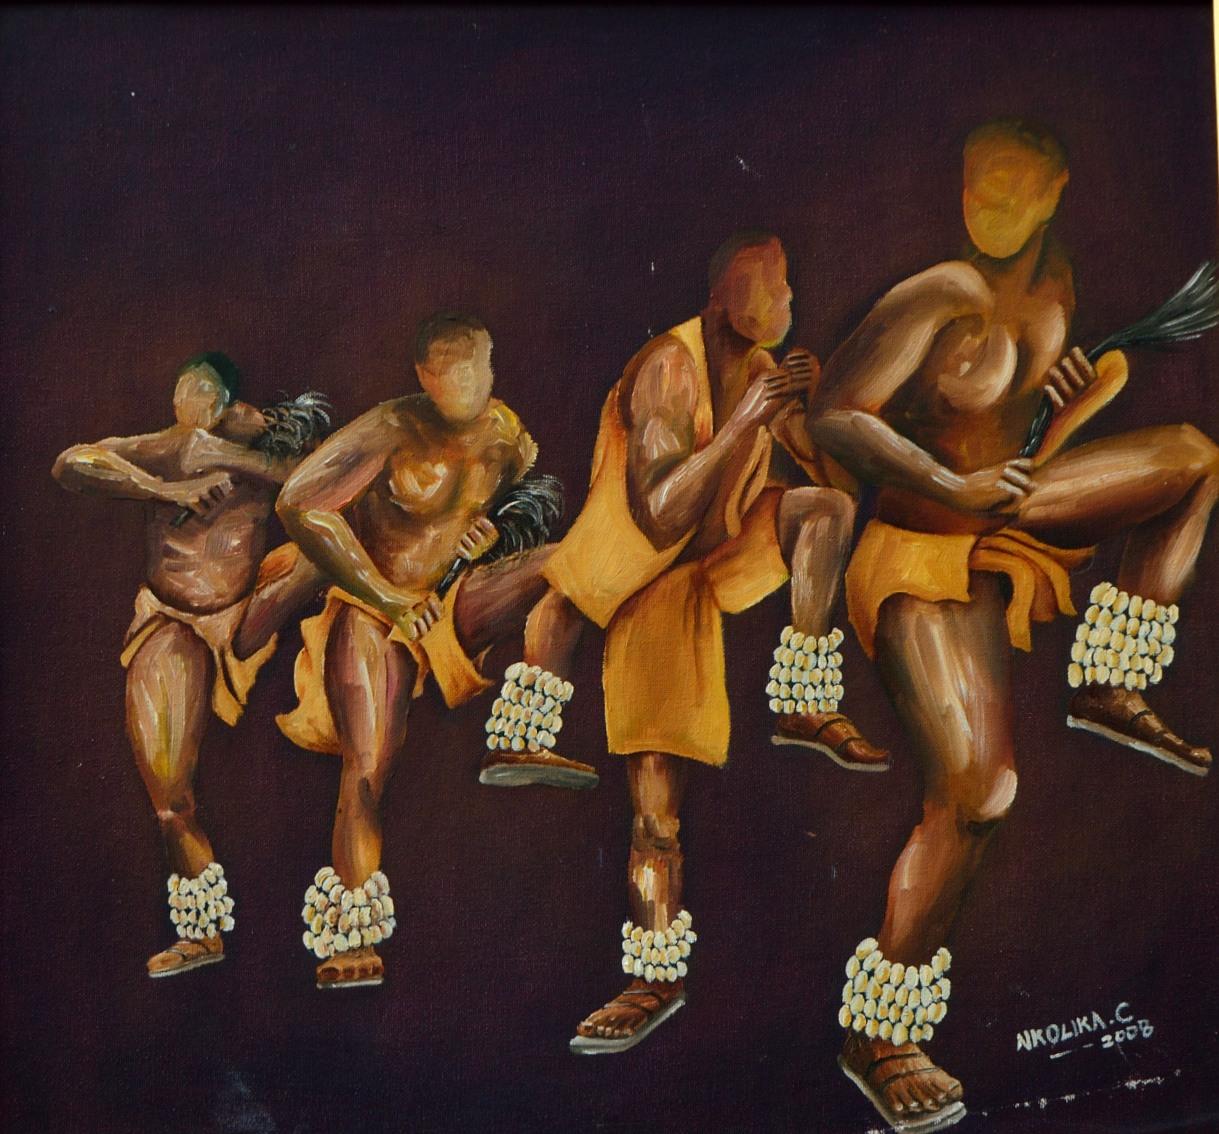 Oil Painting of Botswana dancers by Nkolika Anyabolu